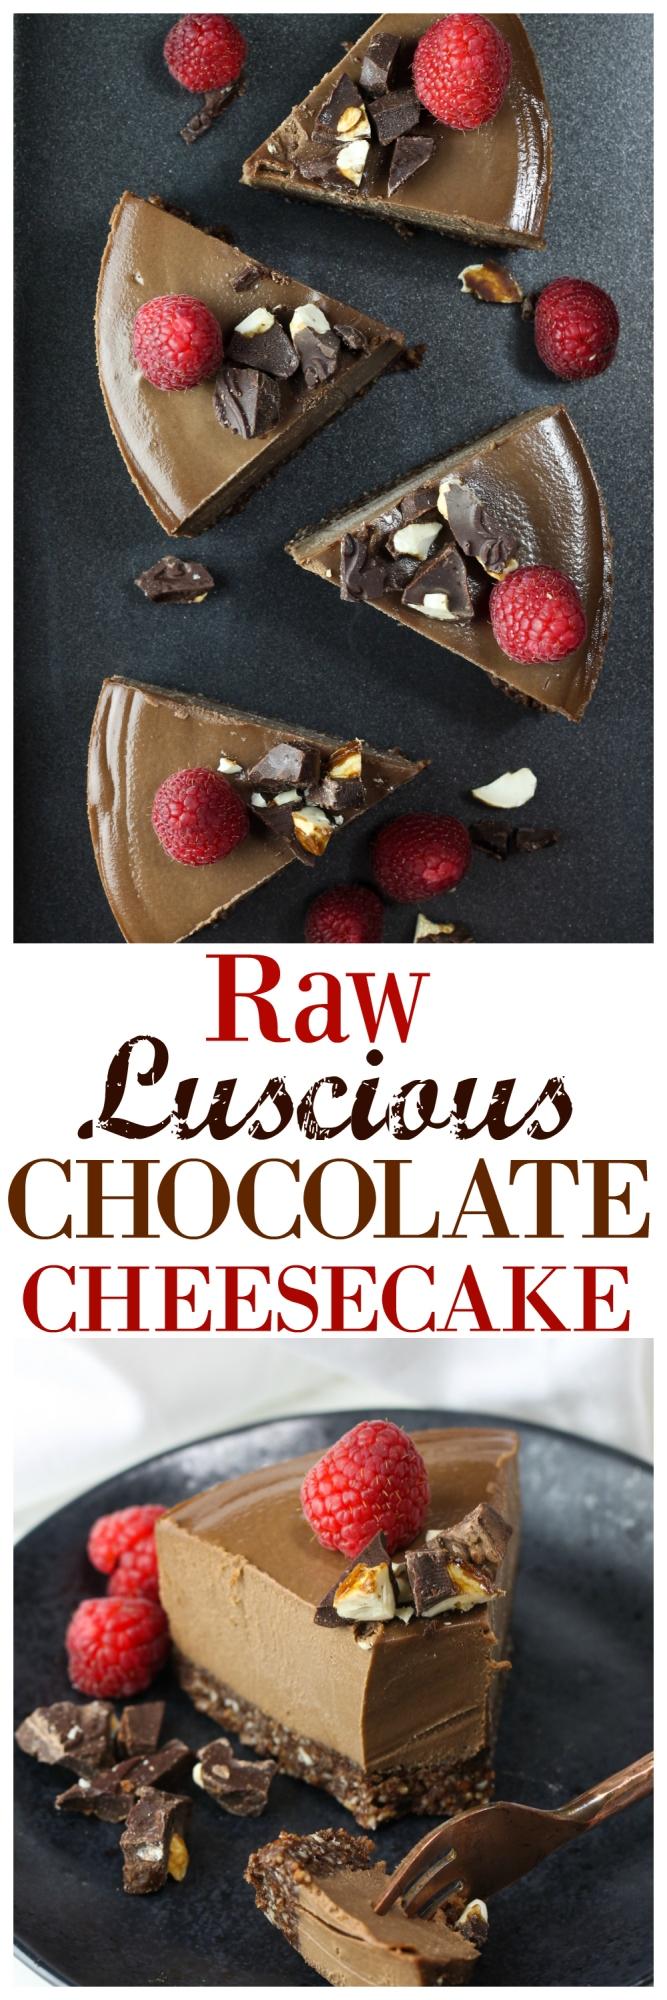 Raw Luscious Chocolate Cheesecake